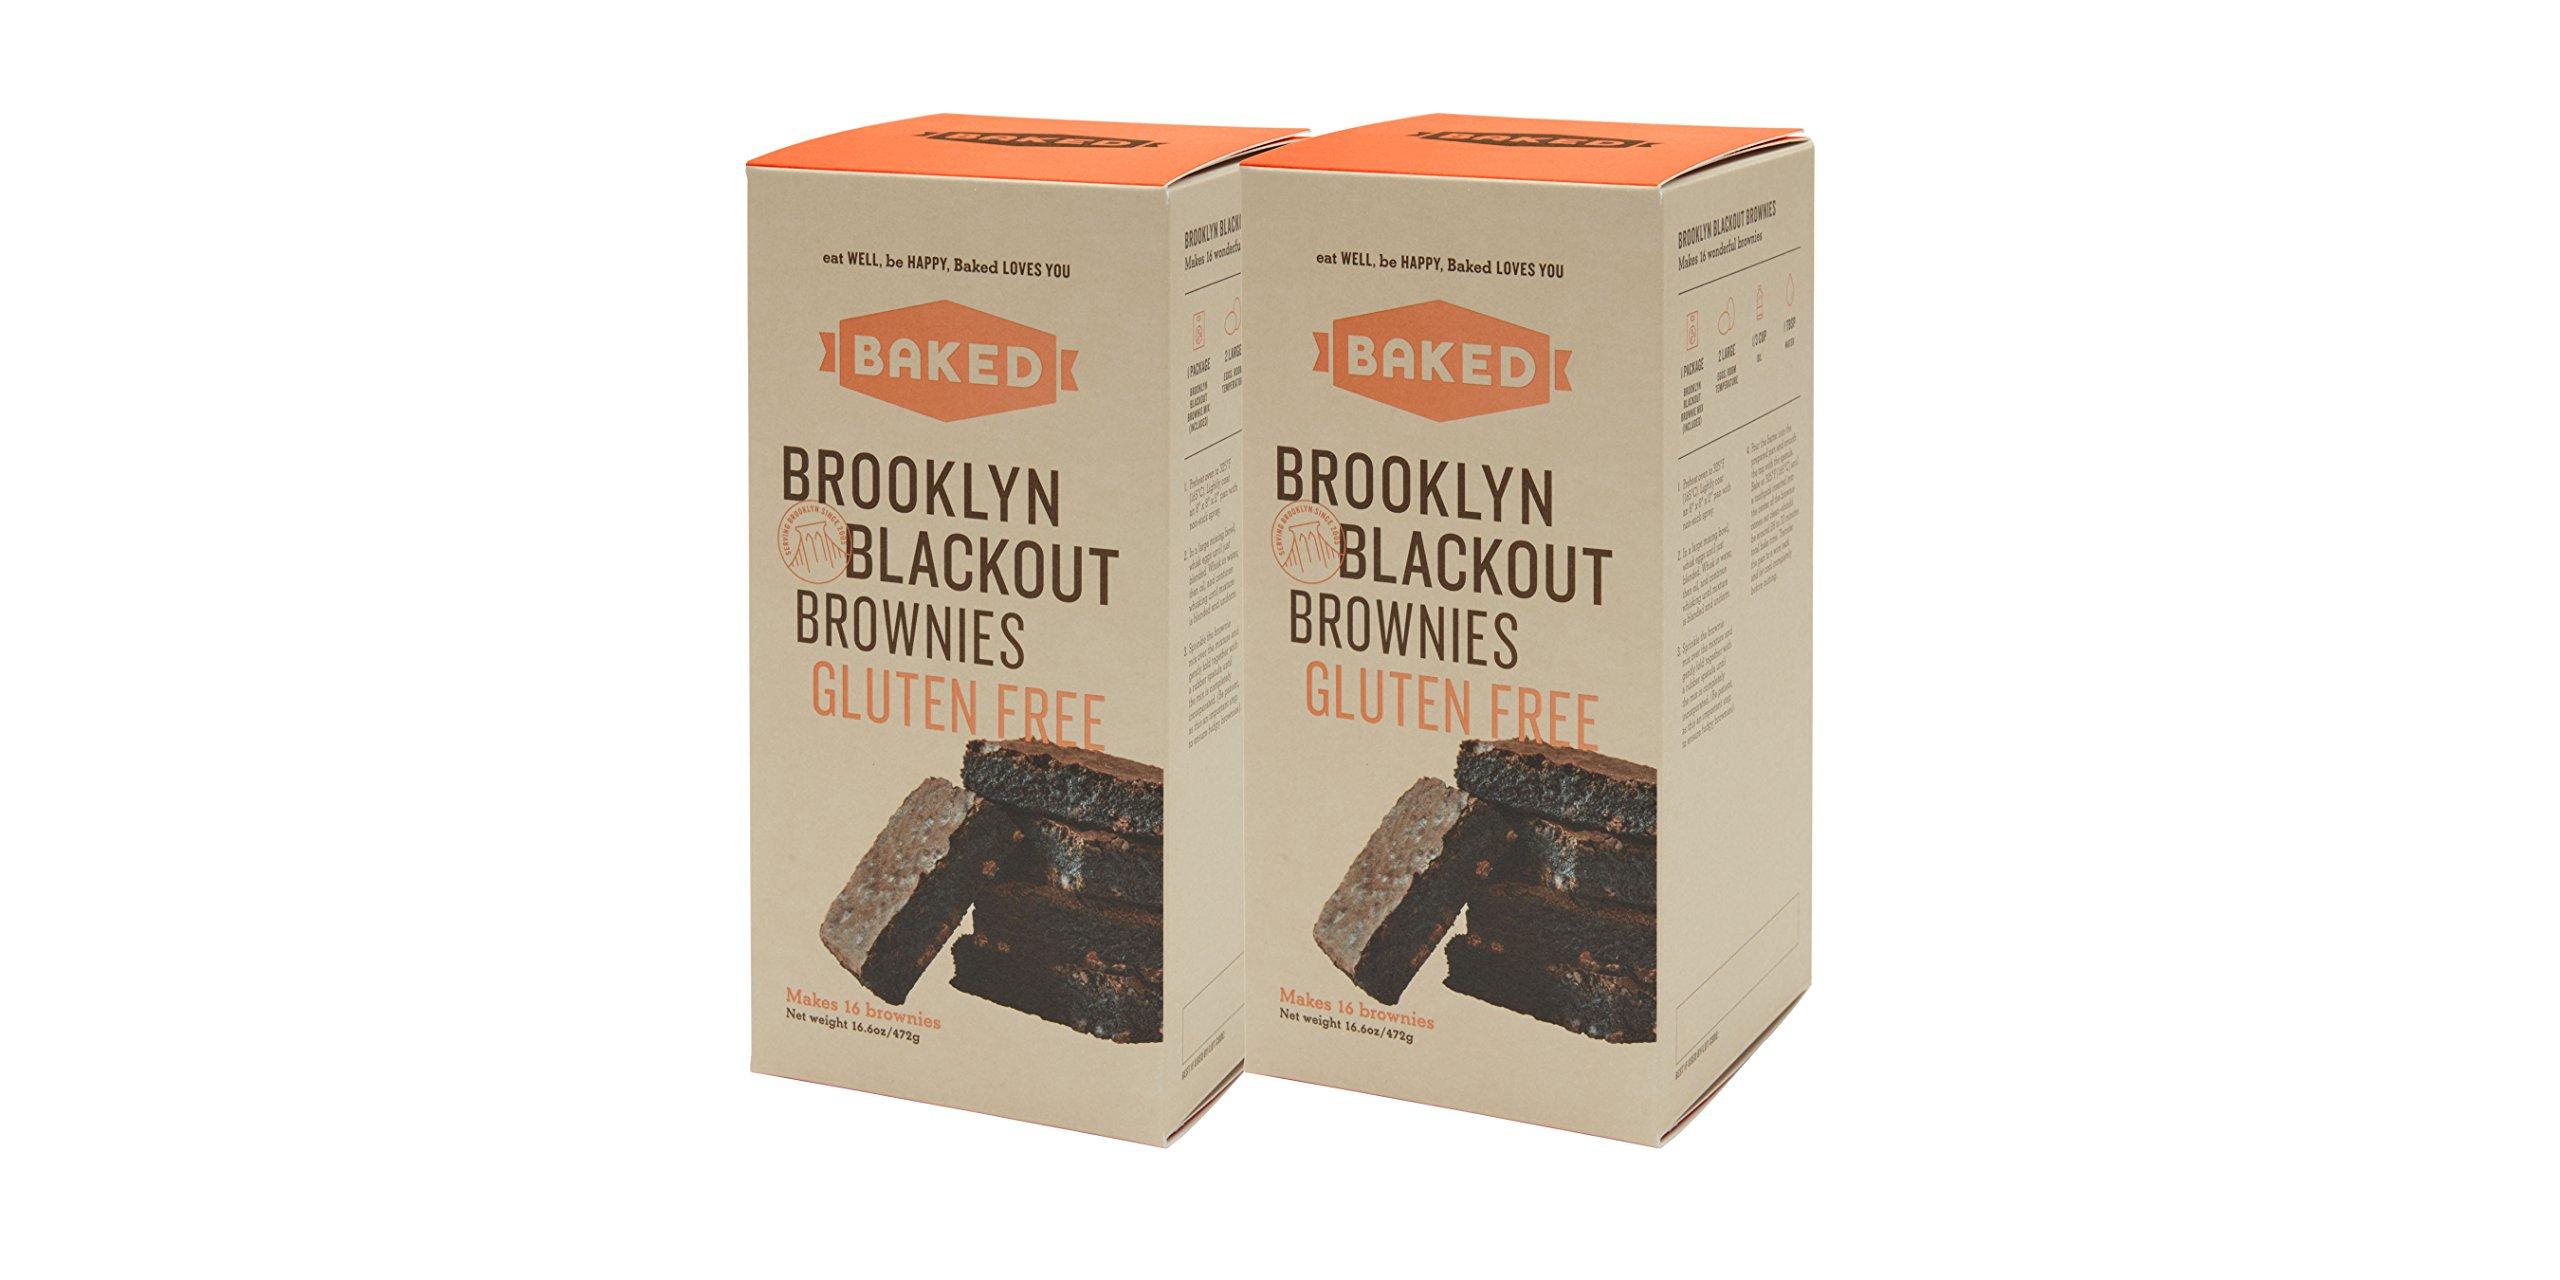 Baked Gluten Free Brooklyn Blackout Brownies, Dark Chocolate Chunks, 16.6 Ounce by BakedNYC